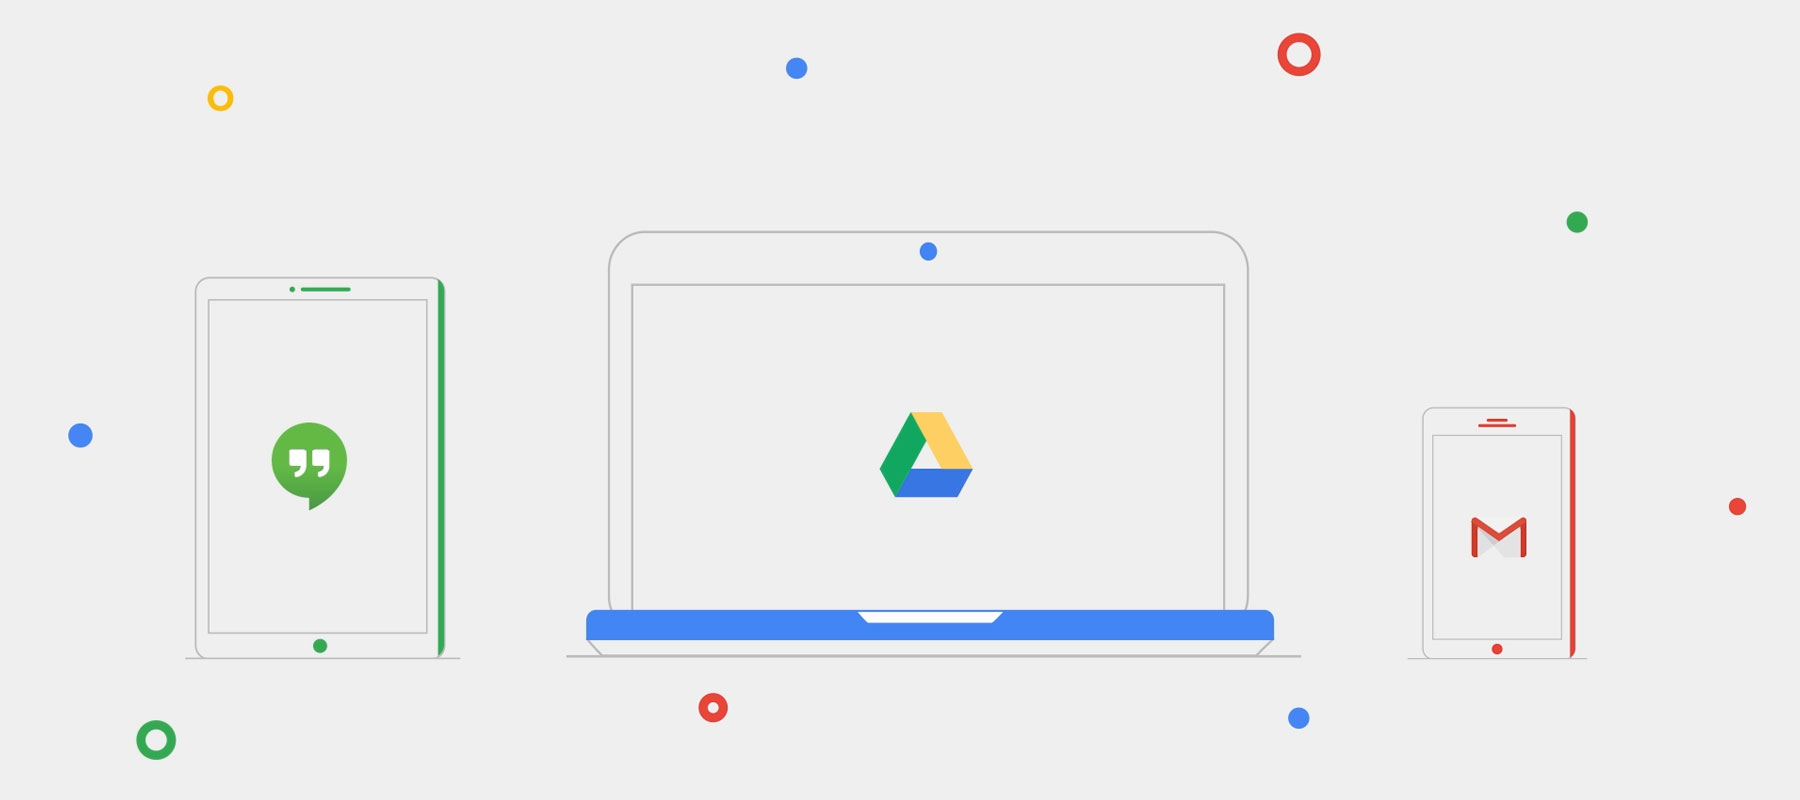 video explicativo google g suite locaweb corp dumela filmes 2 - Google G Suite & Locaweb Corp